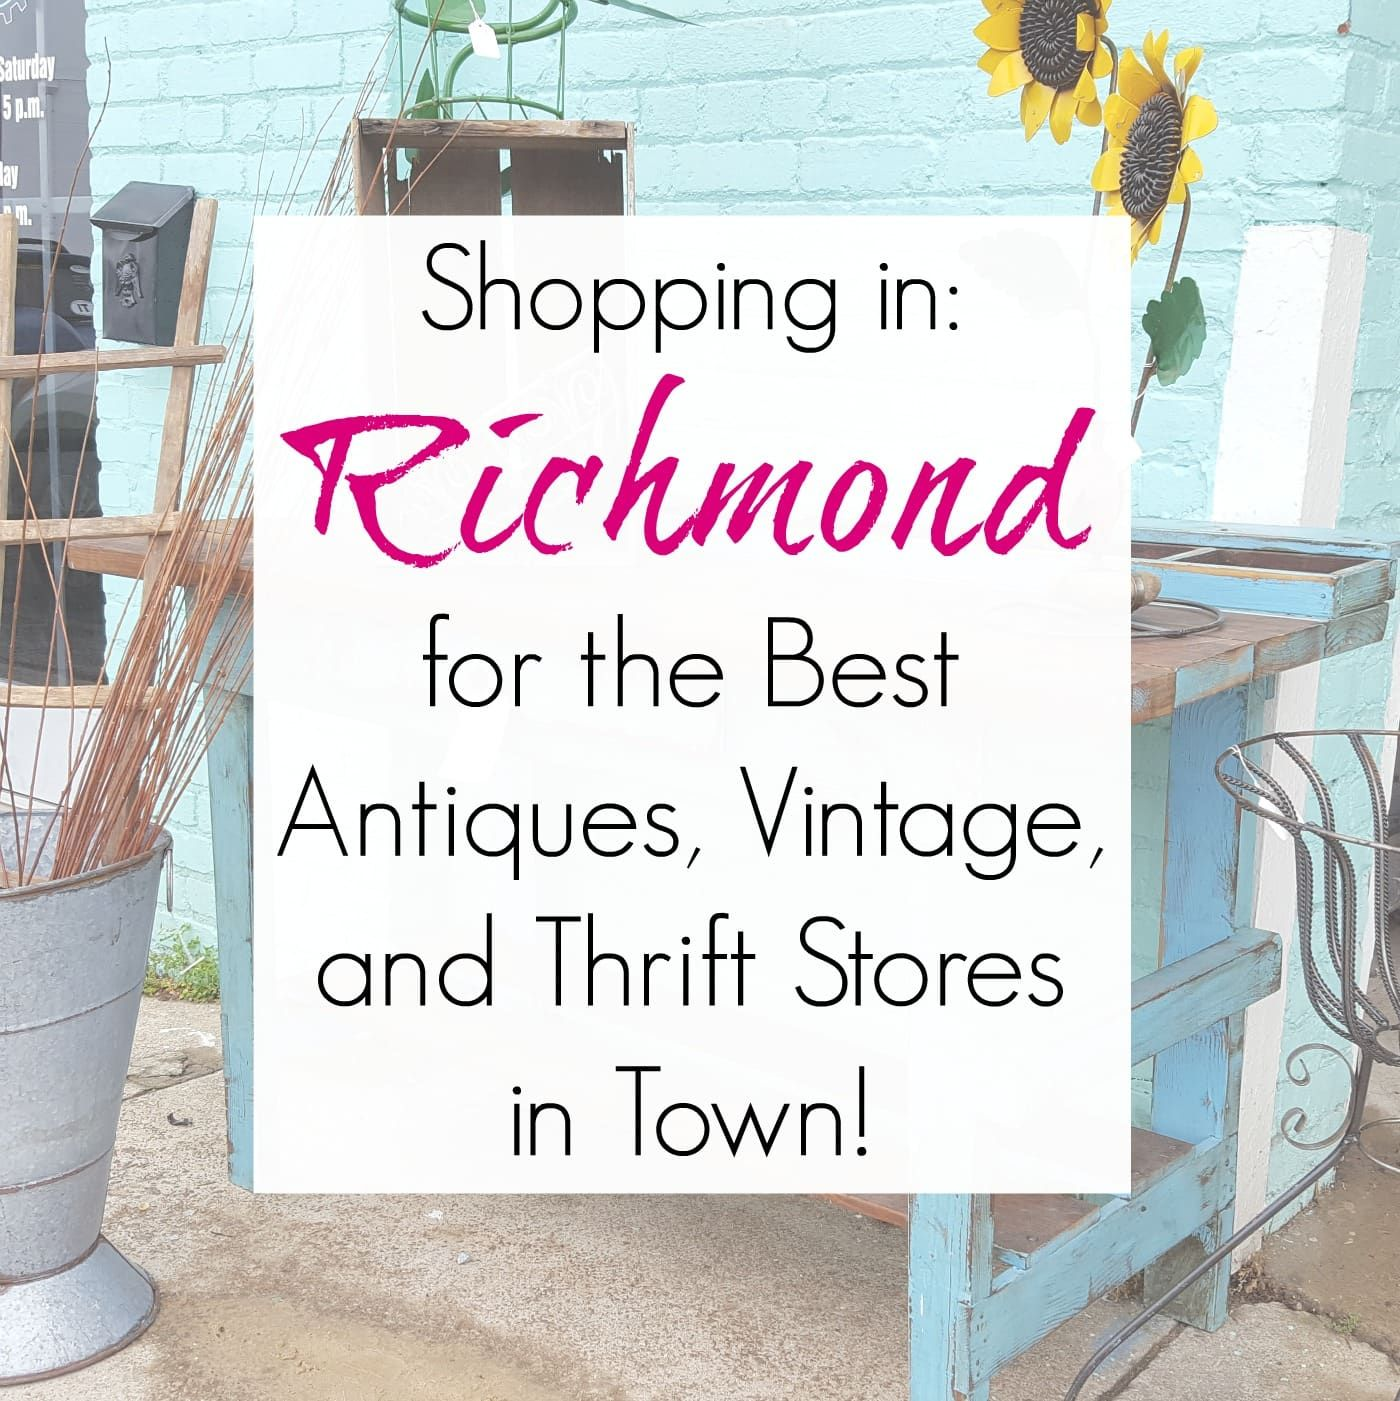 Antiques Vintage Architectural Salvage Thrift Stores In Richmond Va Thrift Store Decor Architectural Salvage Thrifting